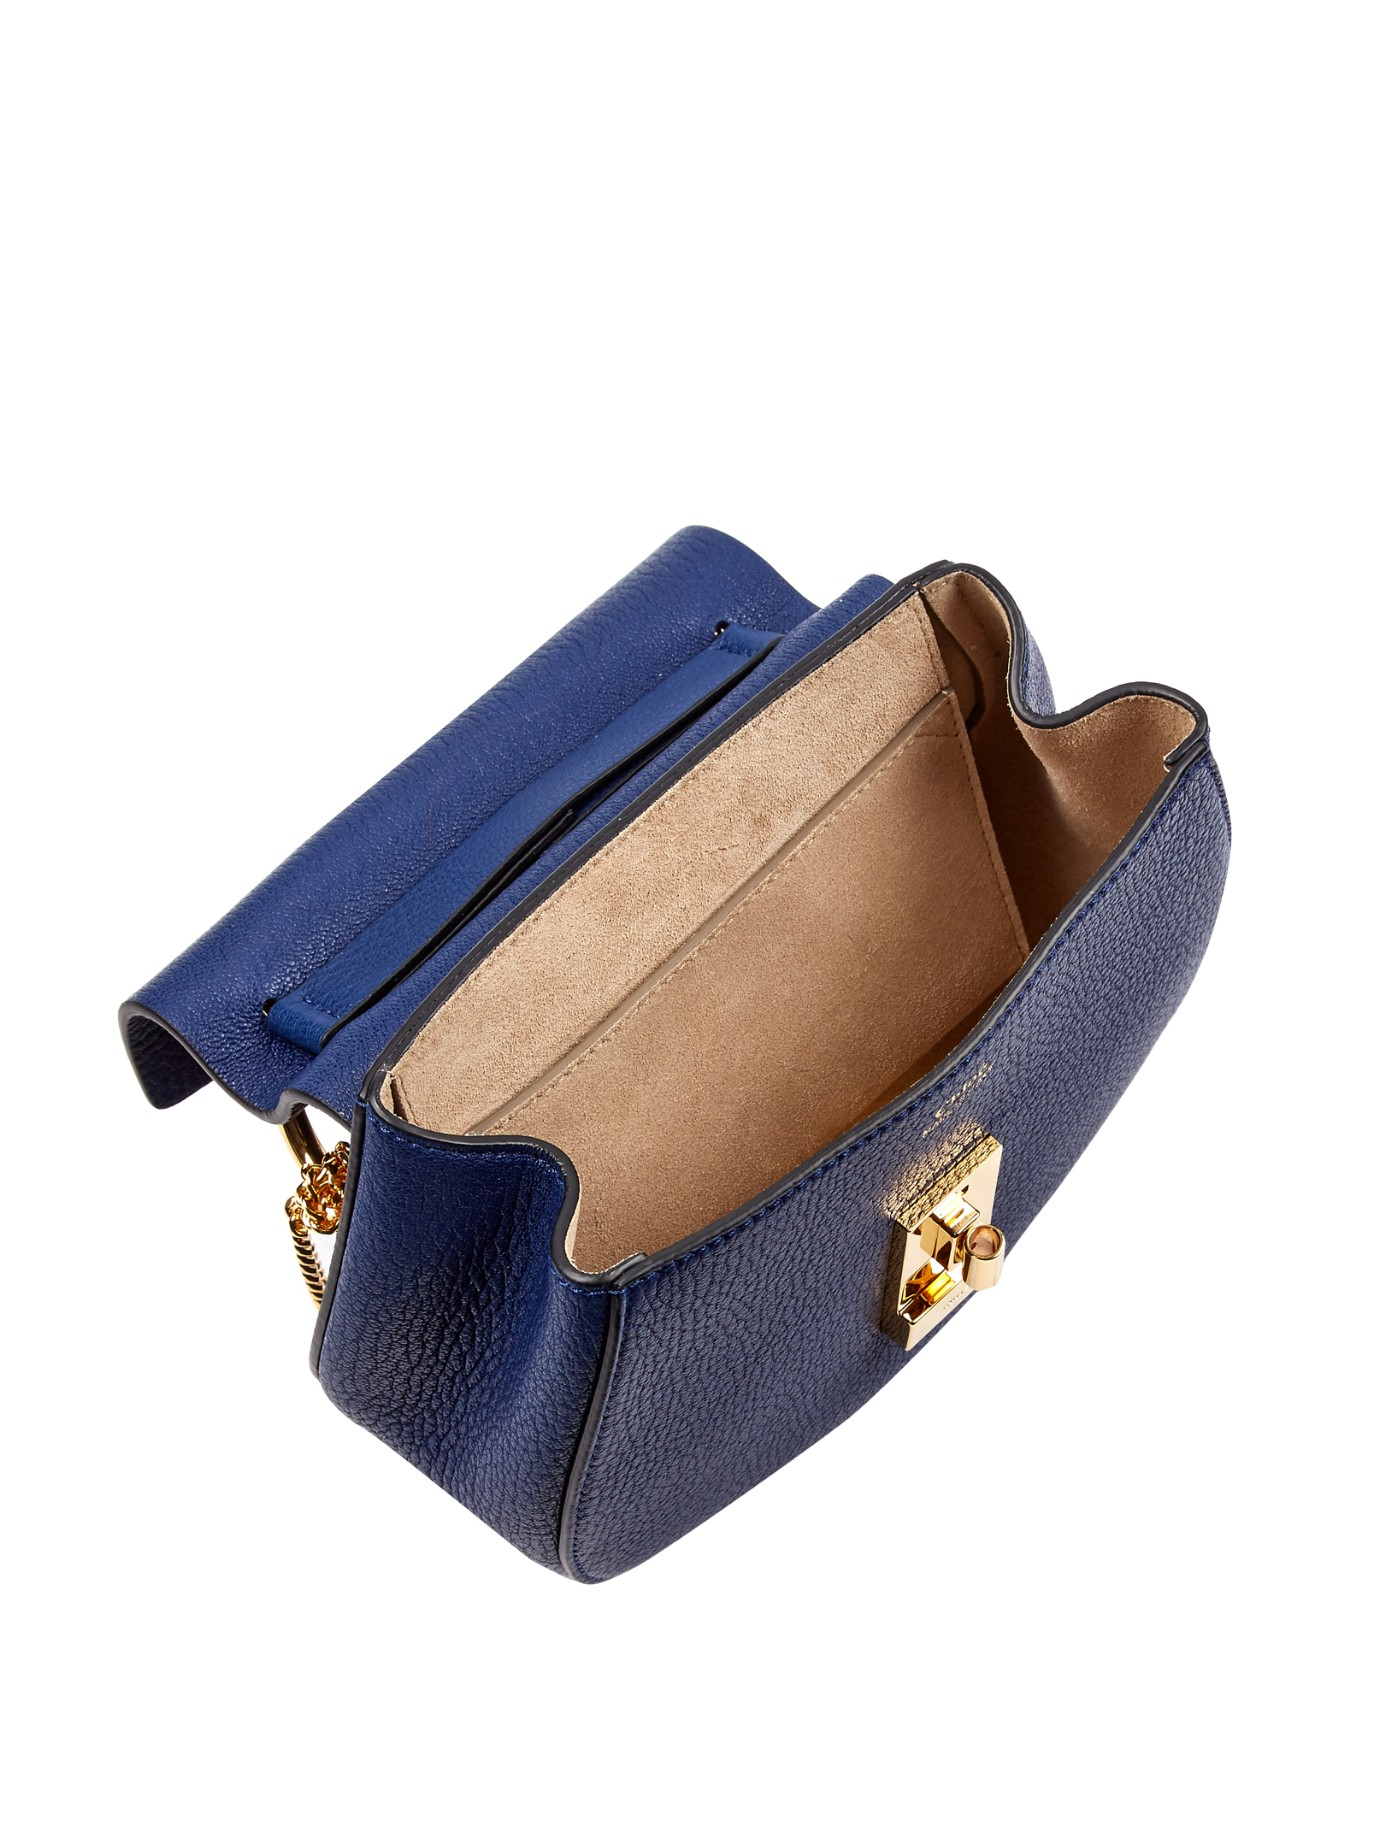 chloe marcie small leather crossbody bag - Chlo�� Drew Mini Leather Cross-Body Bag in Blue (NAVY) | Lyst